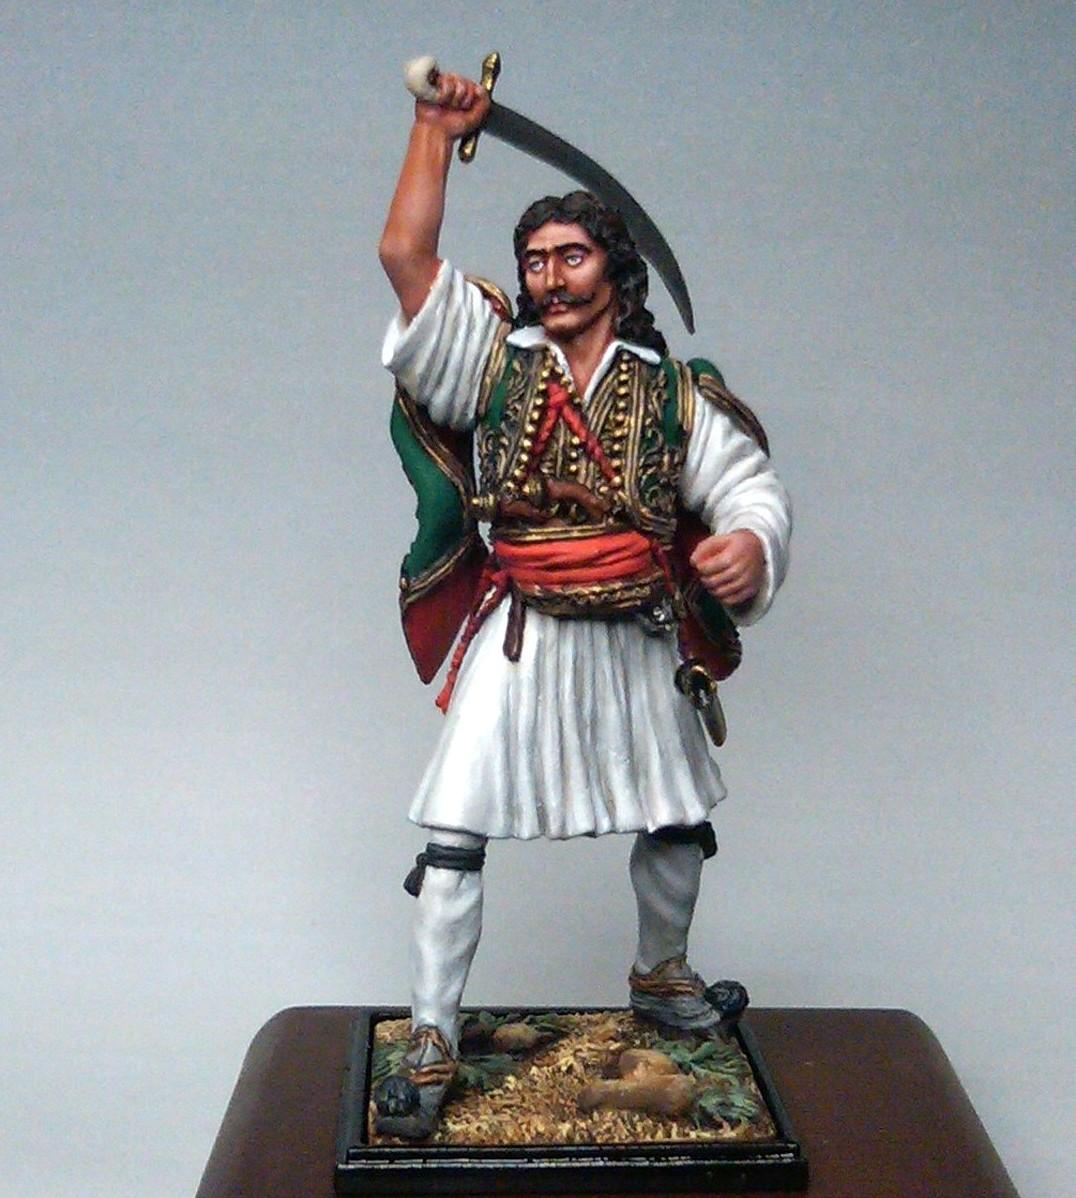 www.greekheroes.gr/miniatures-figures/54mm/Greek-revolution-1821-athanasios-diakos/